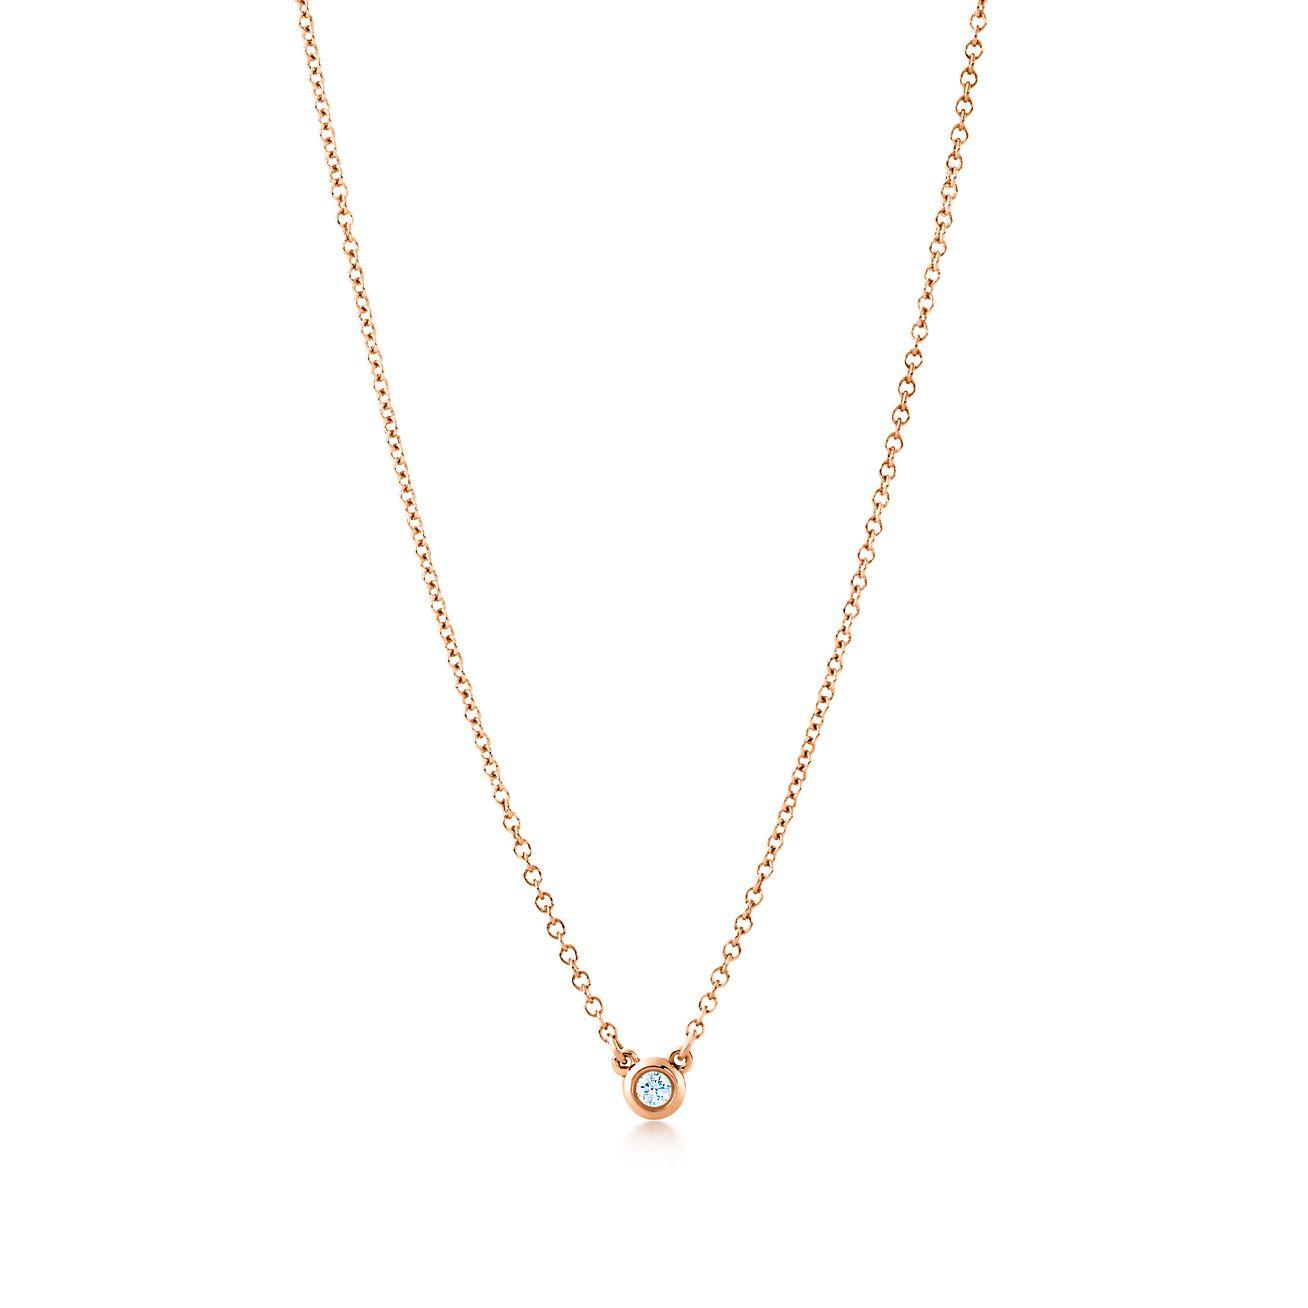 Elsa Peretti Diamonds by the Yard earrings in 18k gold - Size.28 Tiffany & Co. MUc65H